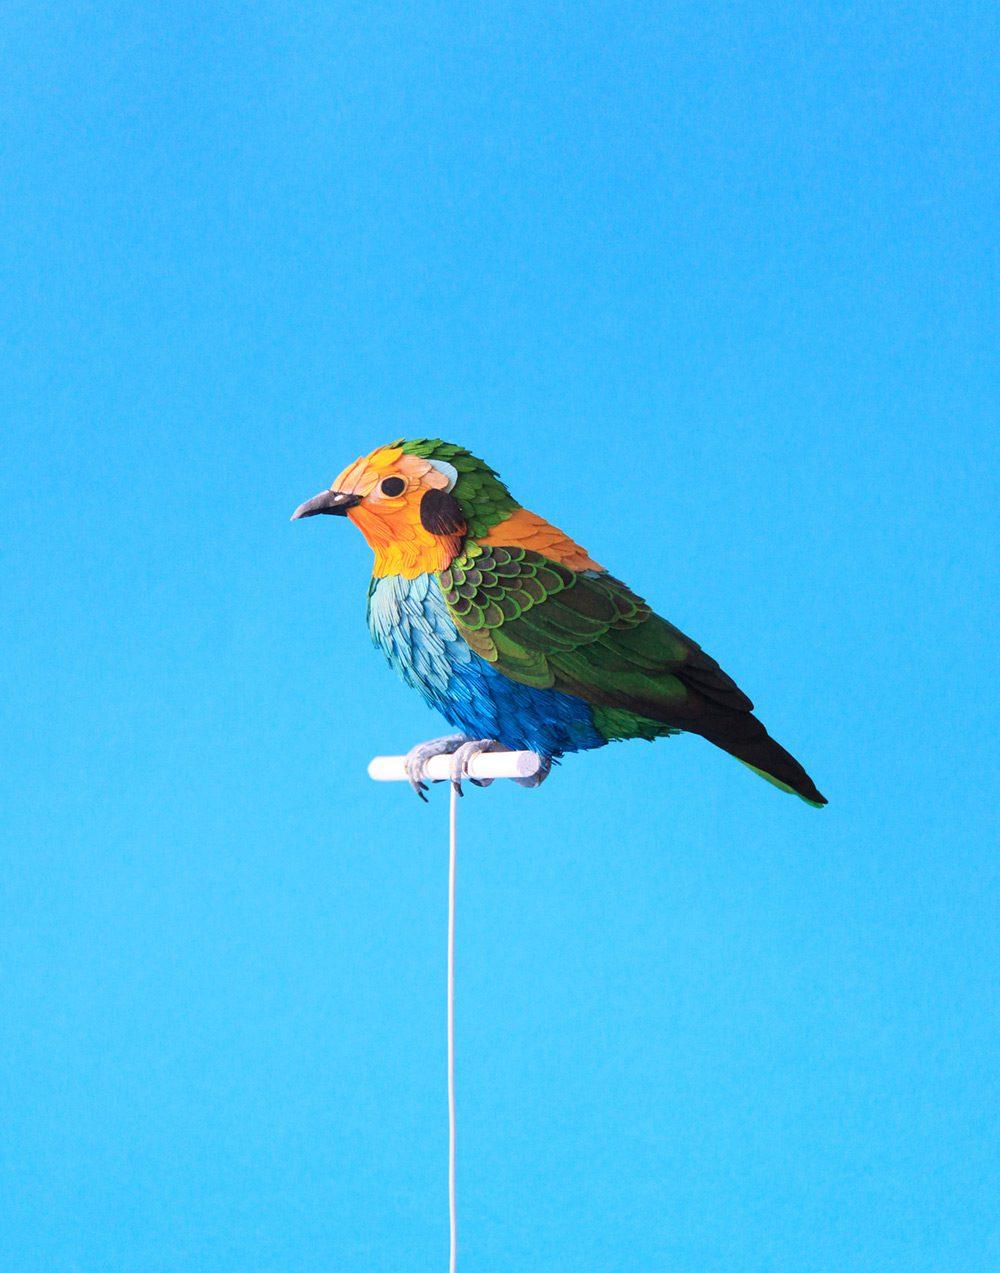 Extraordinary Bird Paper Cut Sculptures By Colombian Artist And Designer Diana Beltran Herrera 1